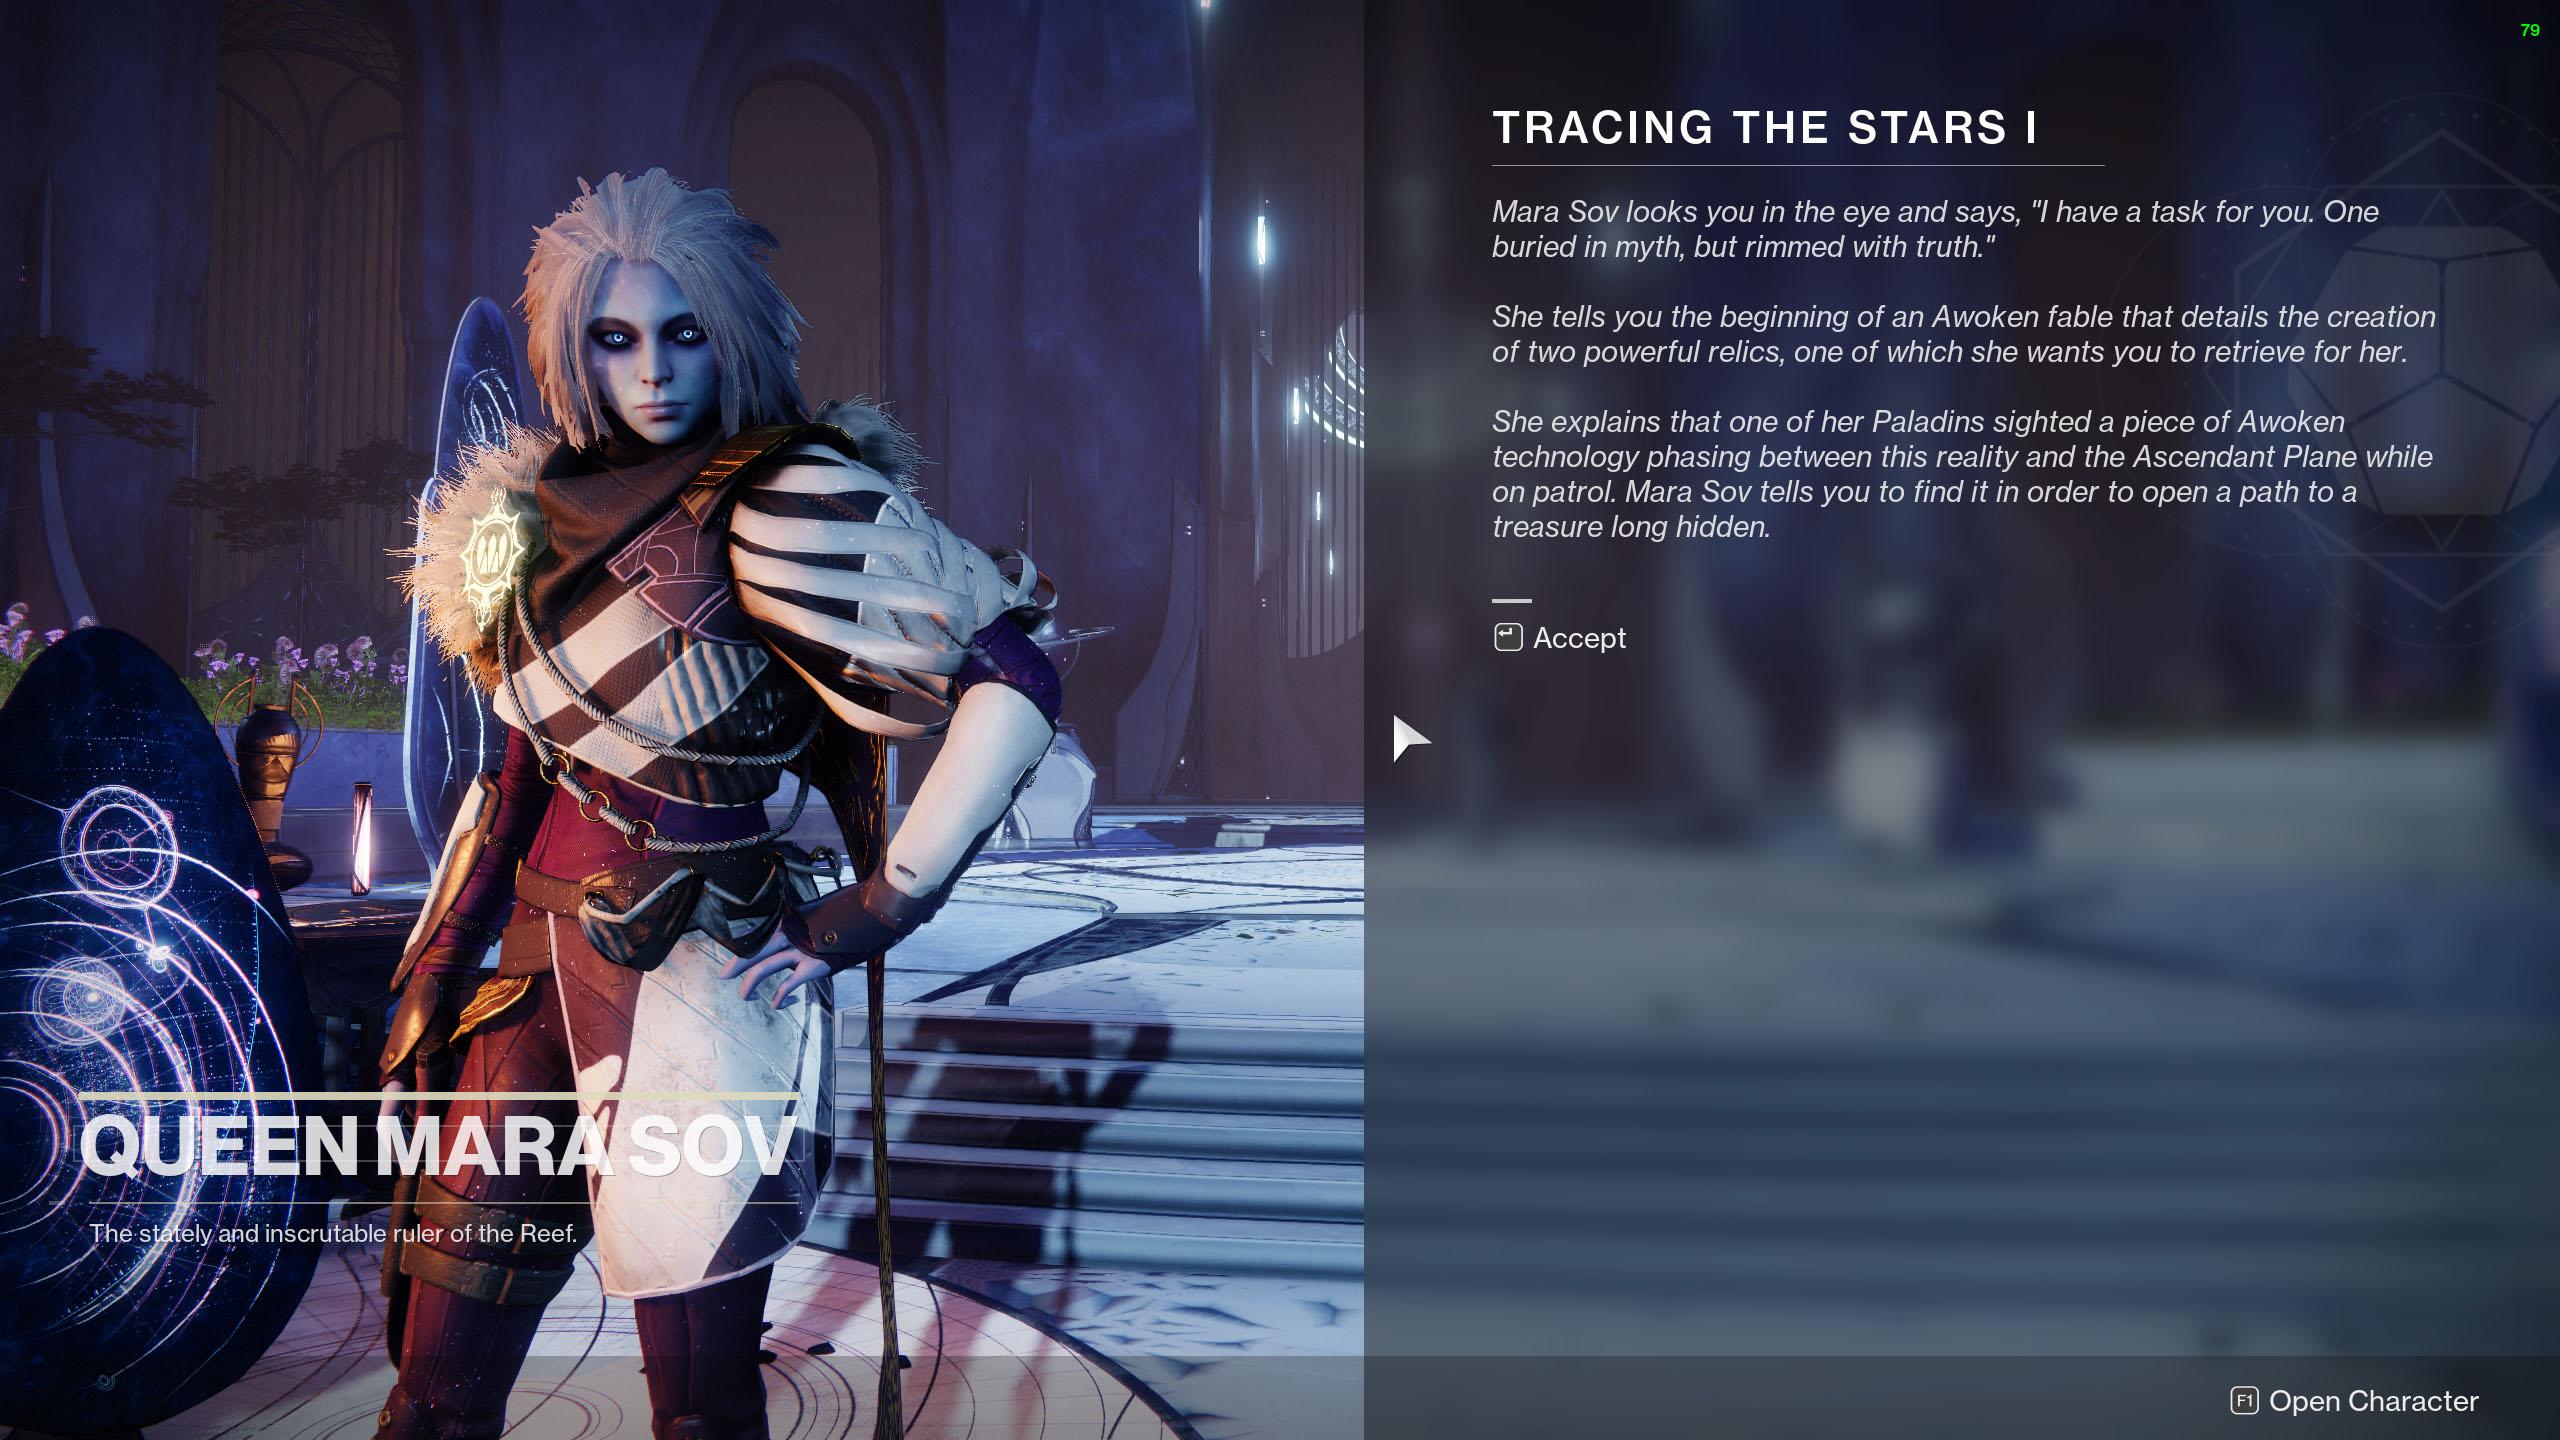 destiny 2 tracing the stars